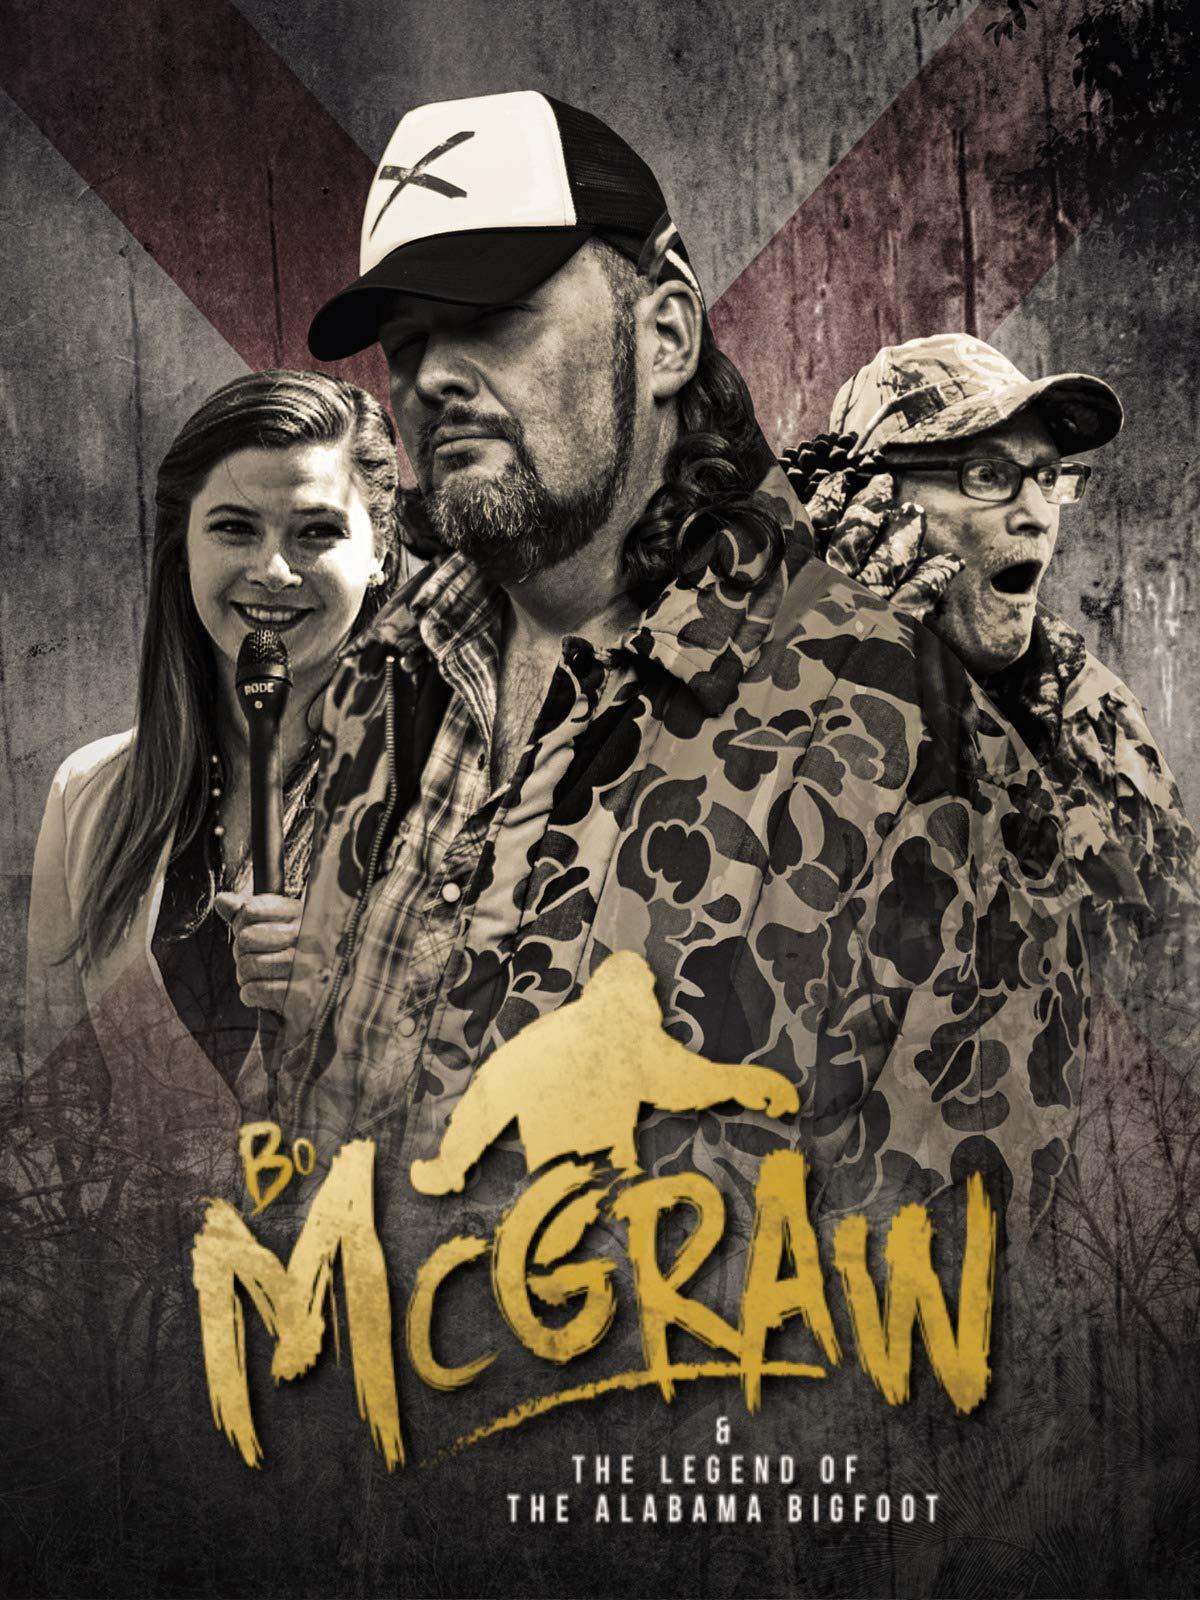 Bo McGraw & The Legend of the Alabama Bigfoot on Amazon Prime Video UK